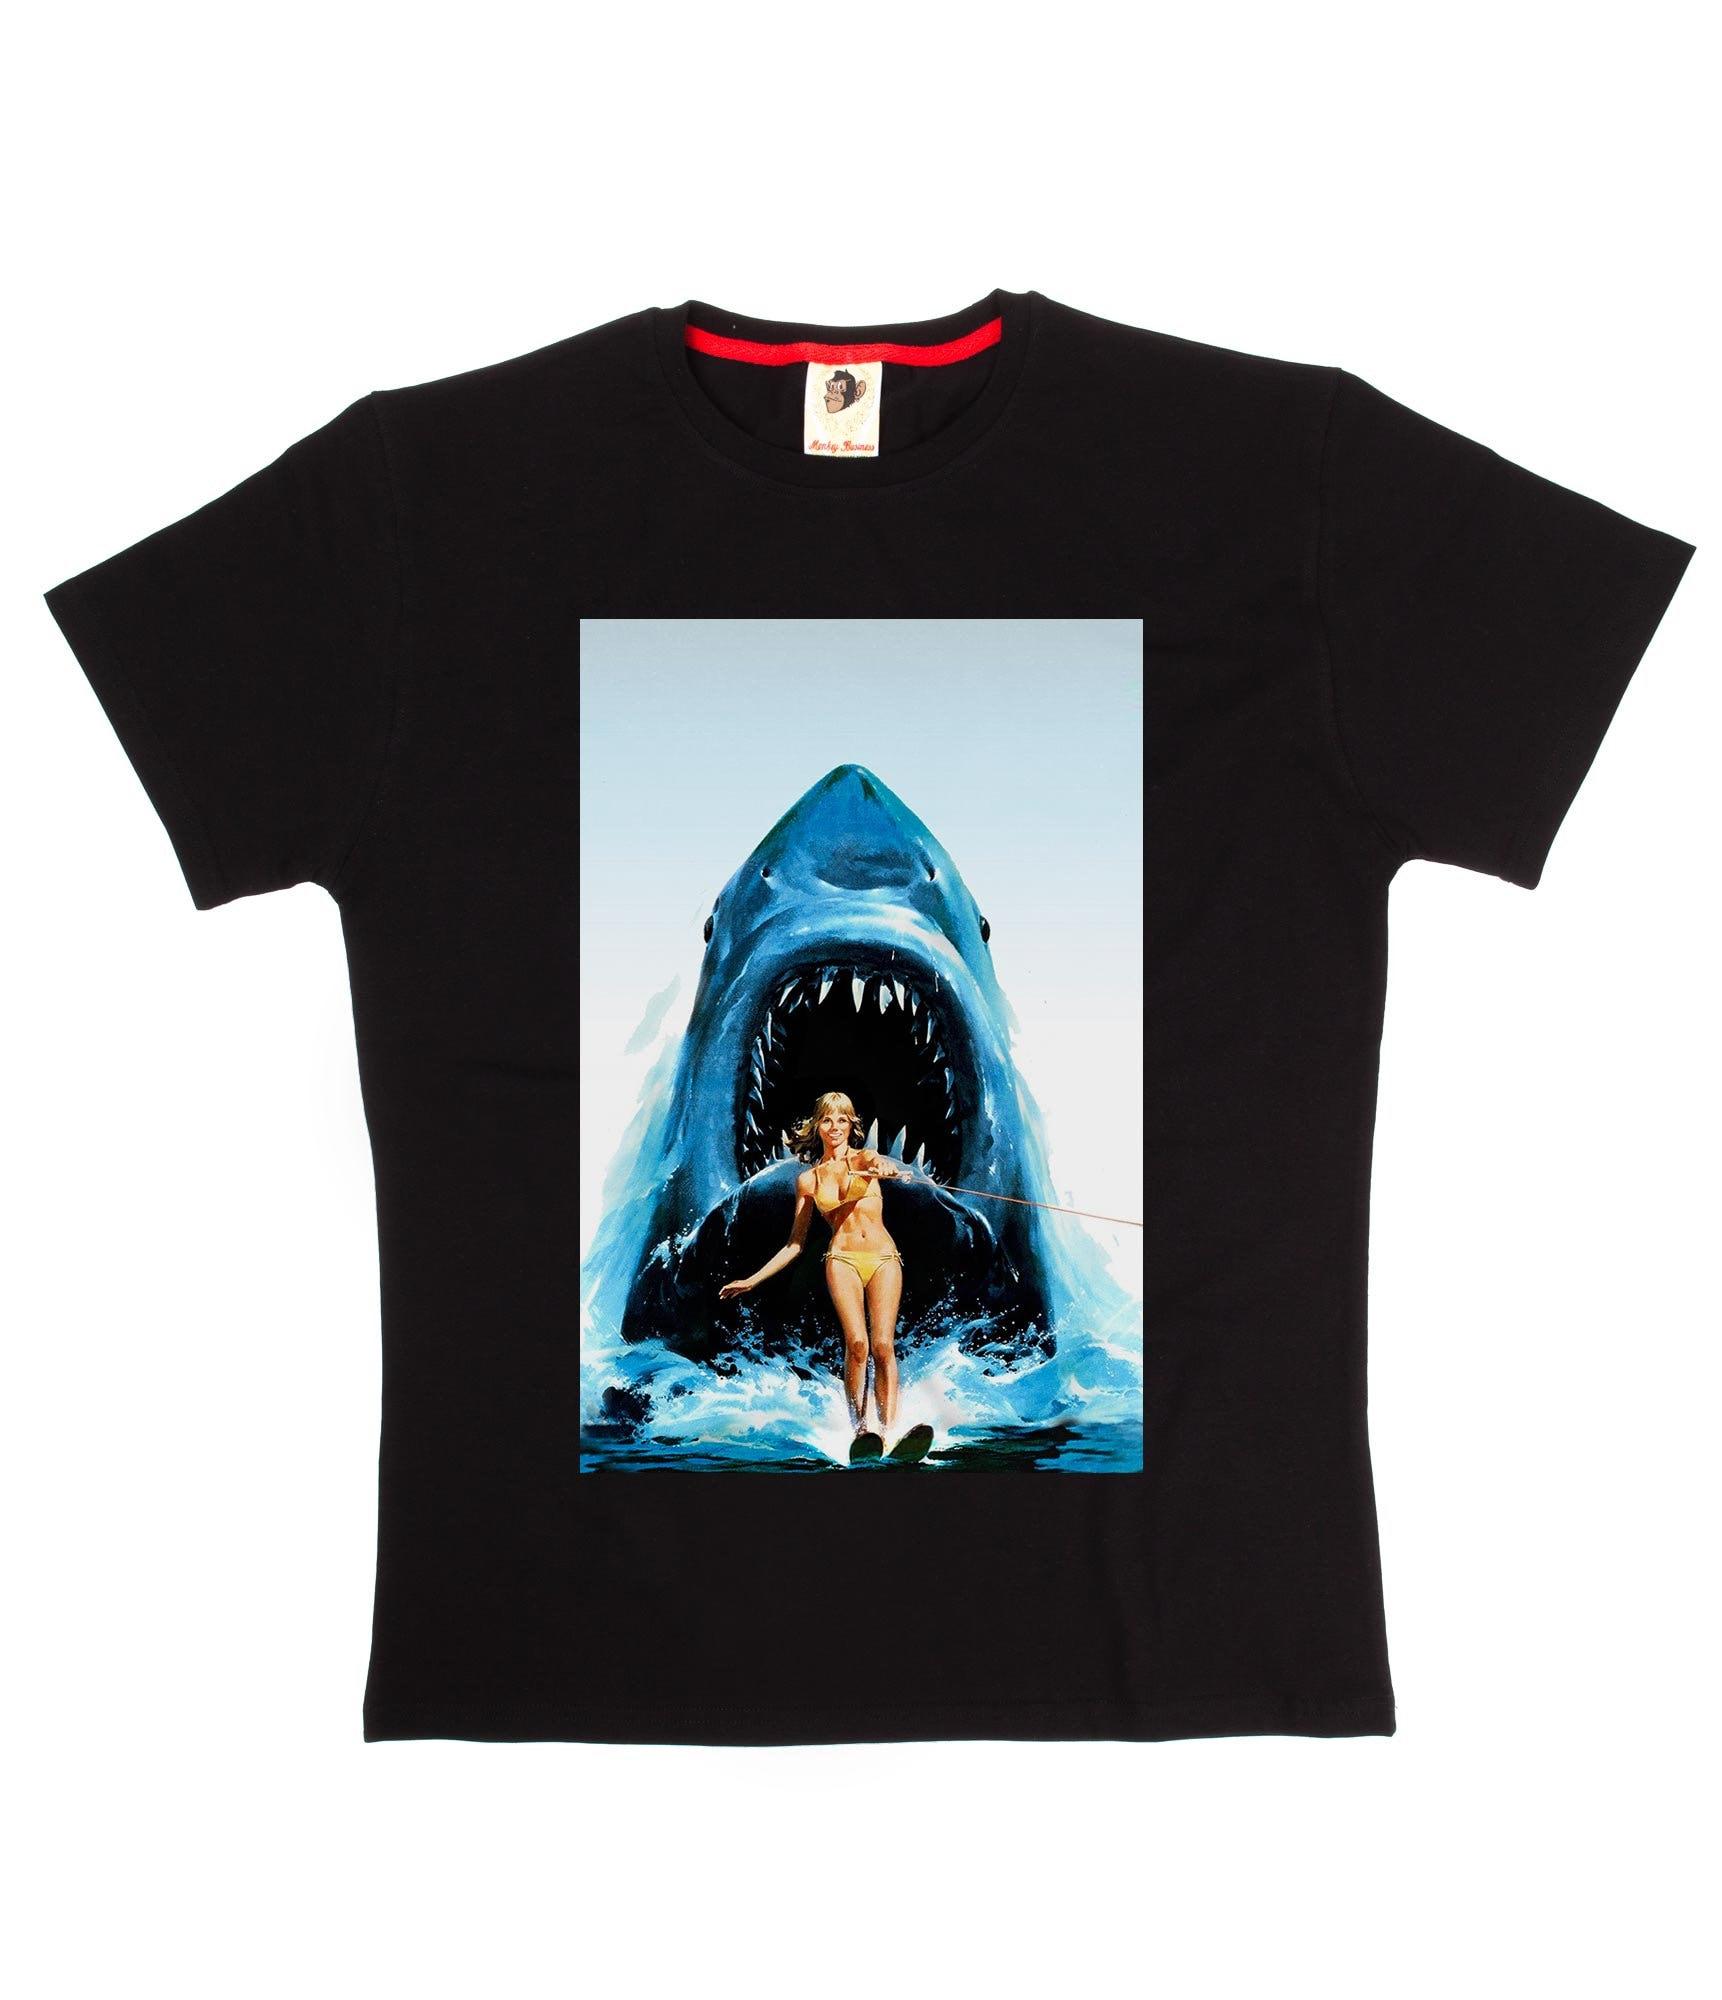 Requin Ski Funky Cool mode Business Funny Design imprimé T-shirt noir blanc Monkey Business mode a3deb6